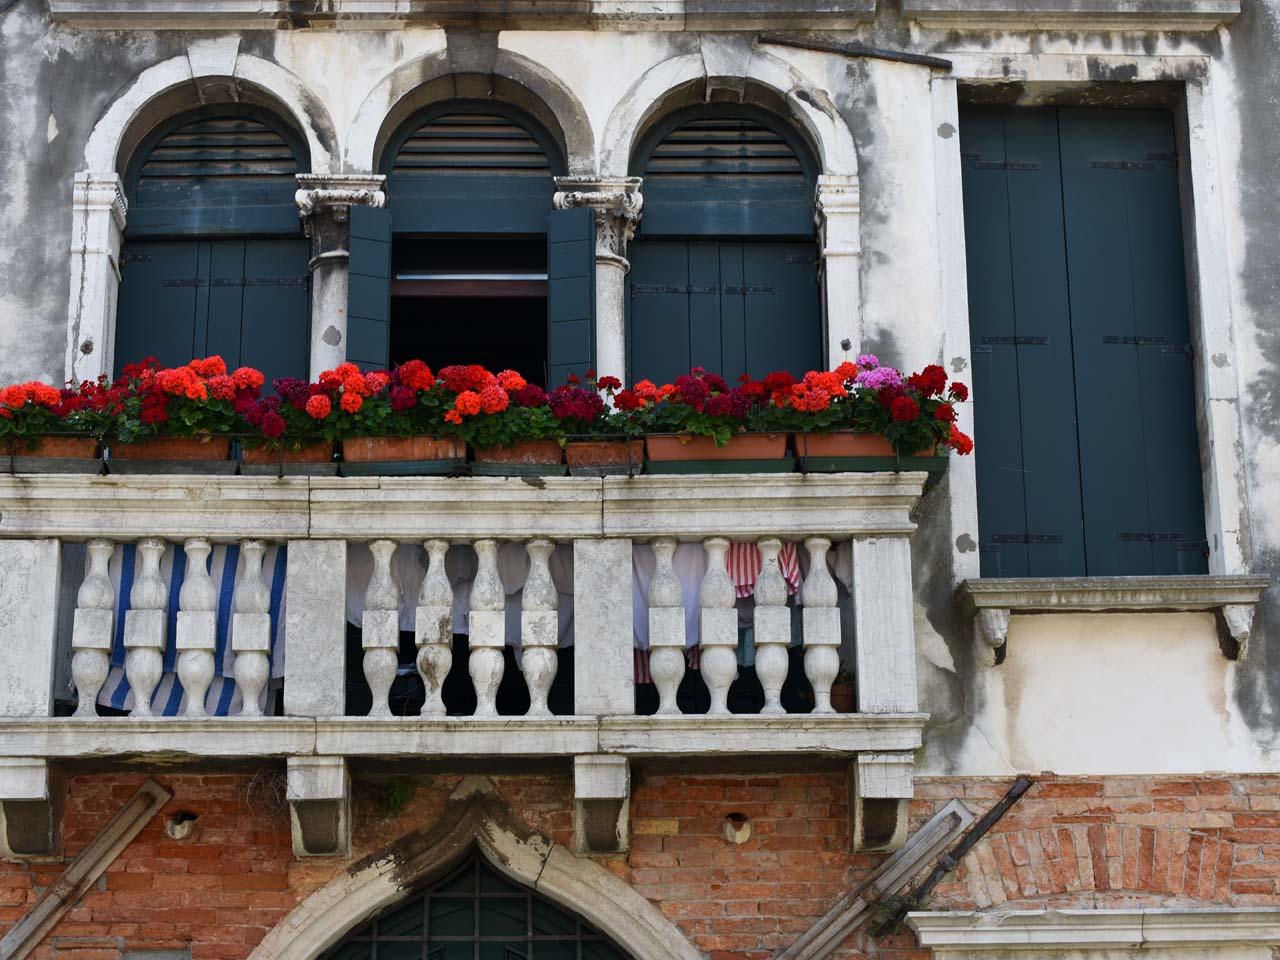 Scenes of Venice